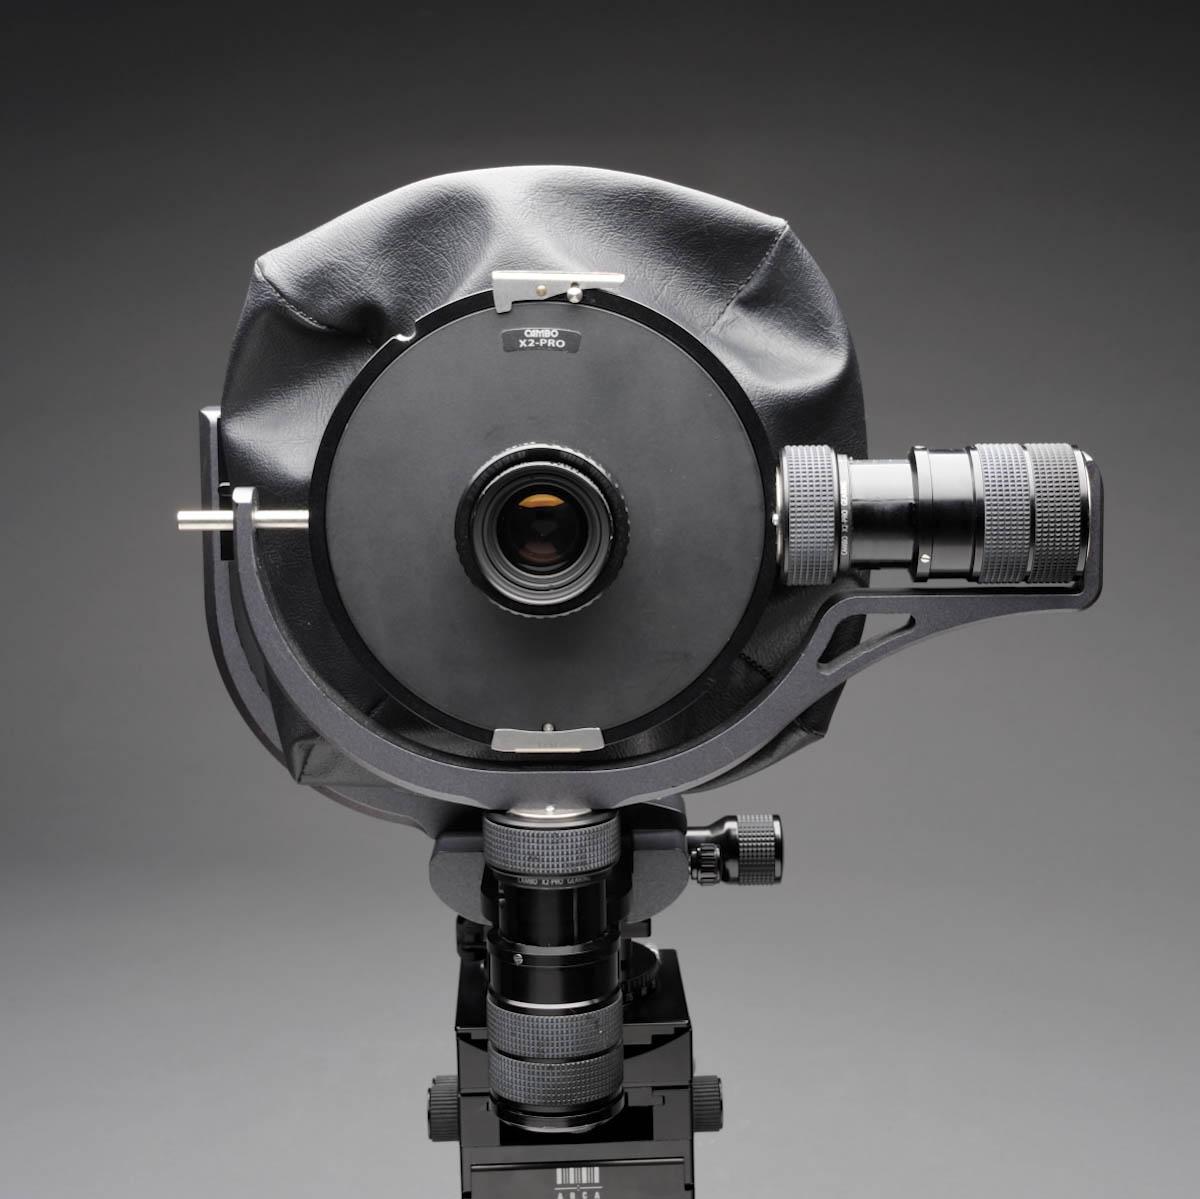 Nikon-D800-Cambo-X2-Pro-Schneider-Kreuznach-APO-90mm-f4.5-9